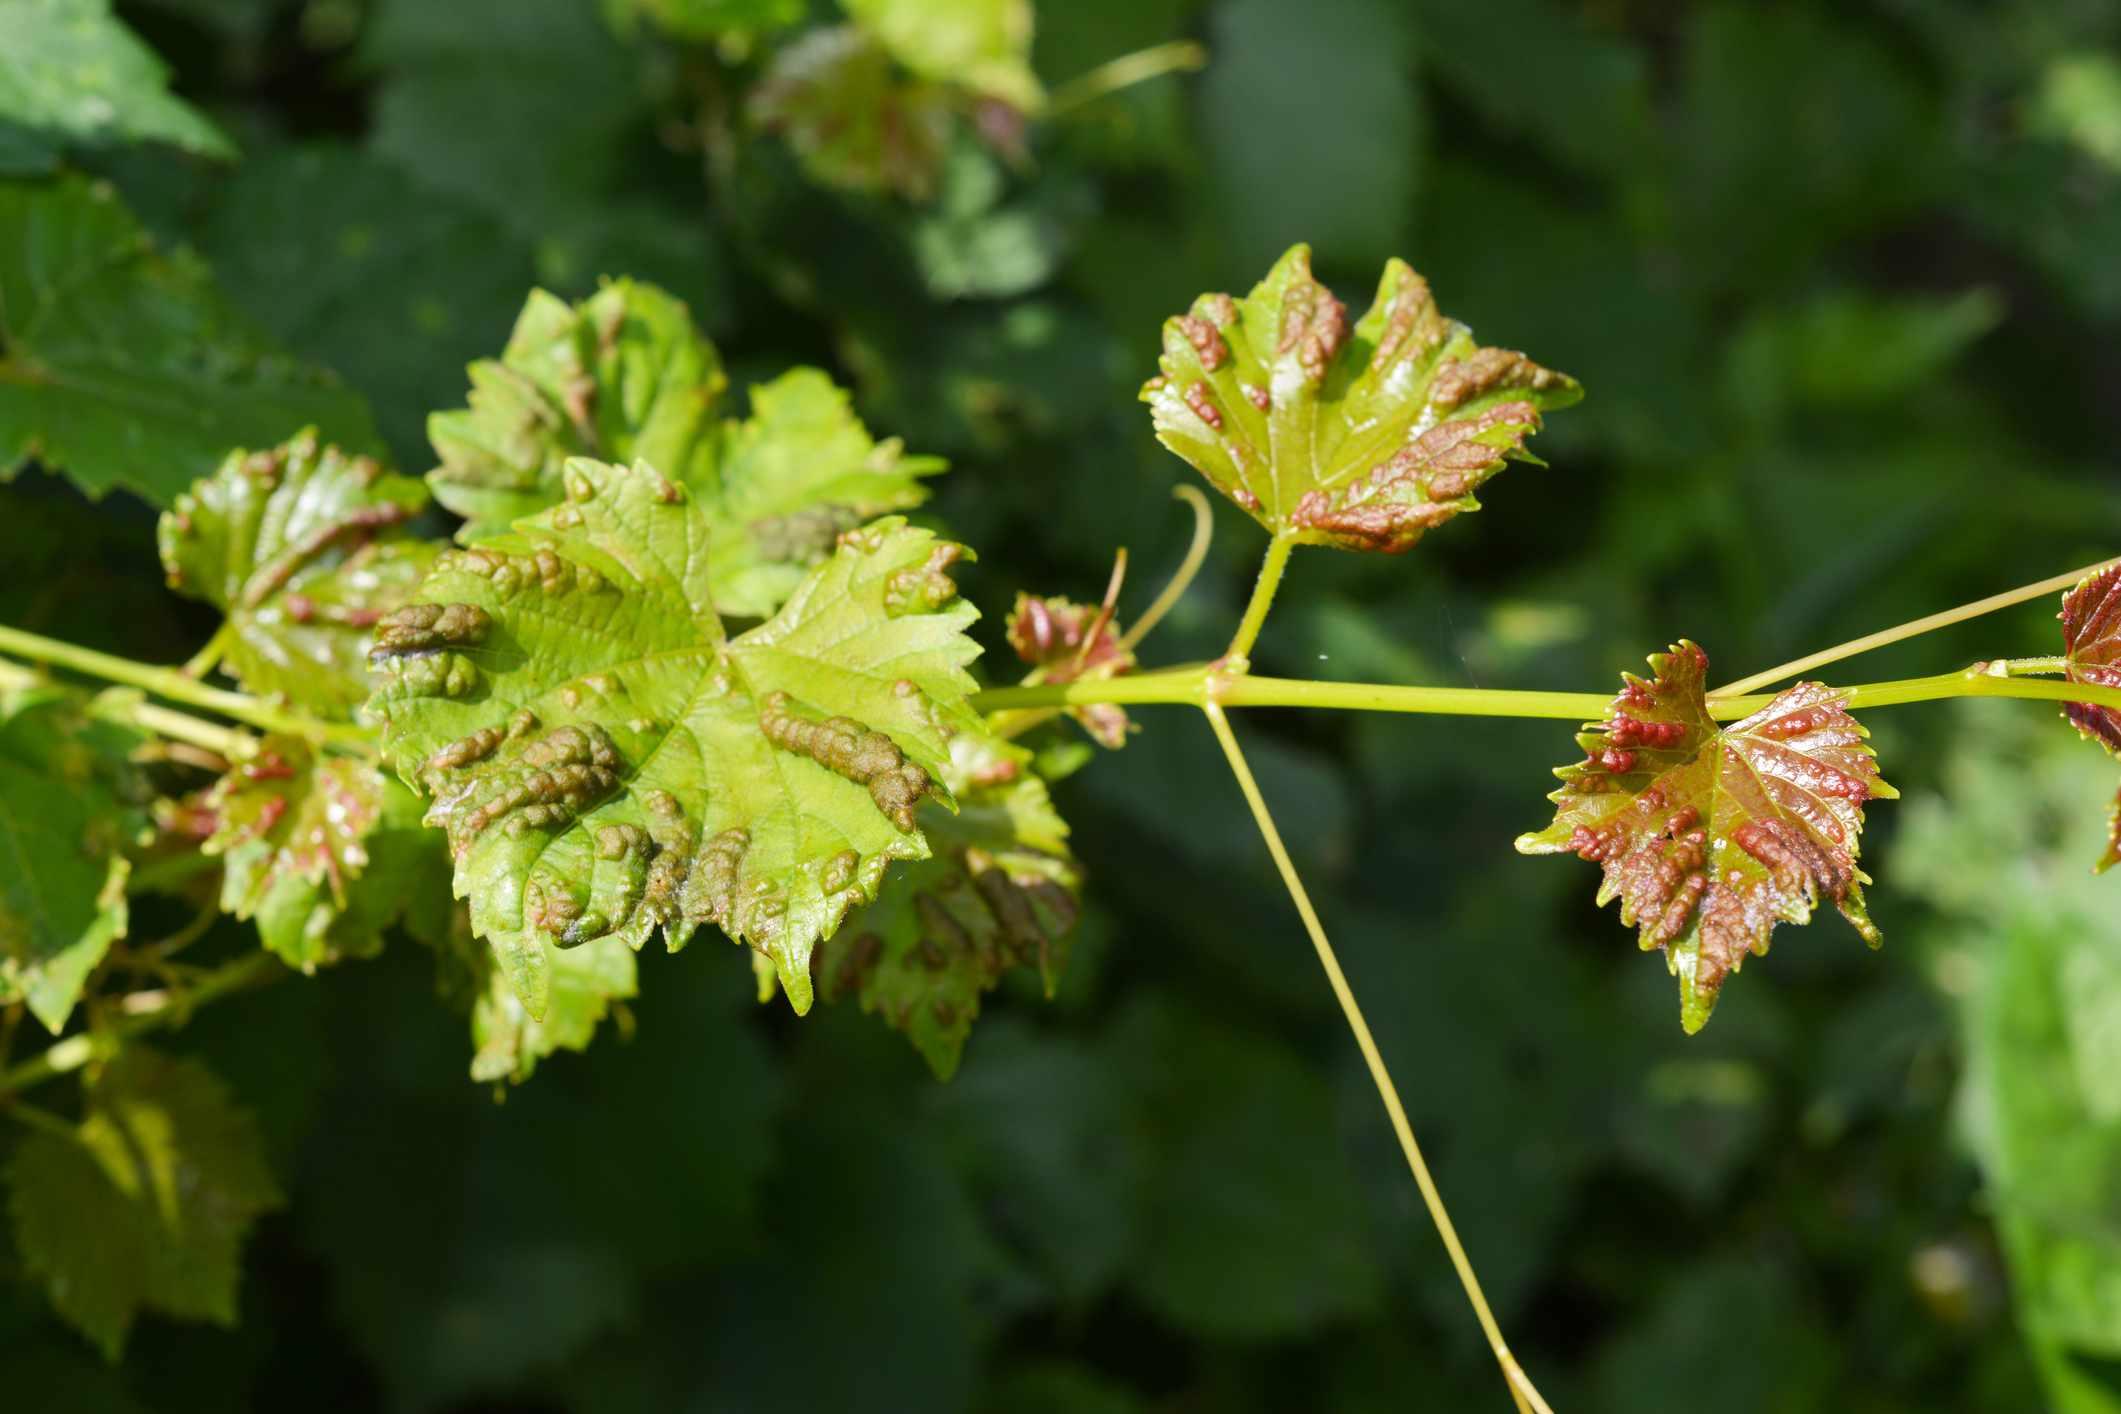 Anthracnose of grapes (Elsinoe ampelina)